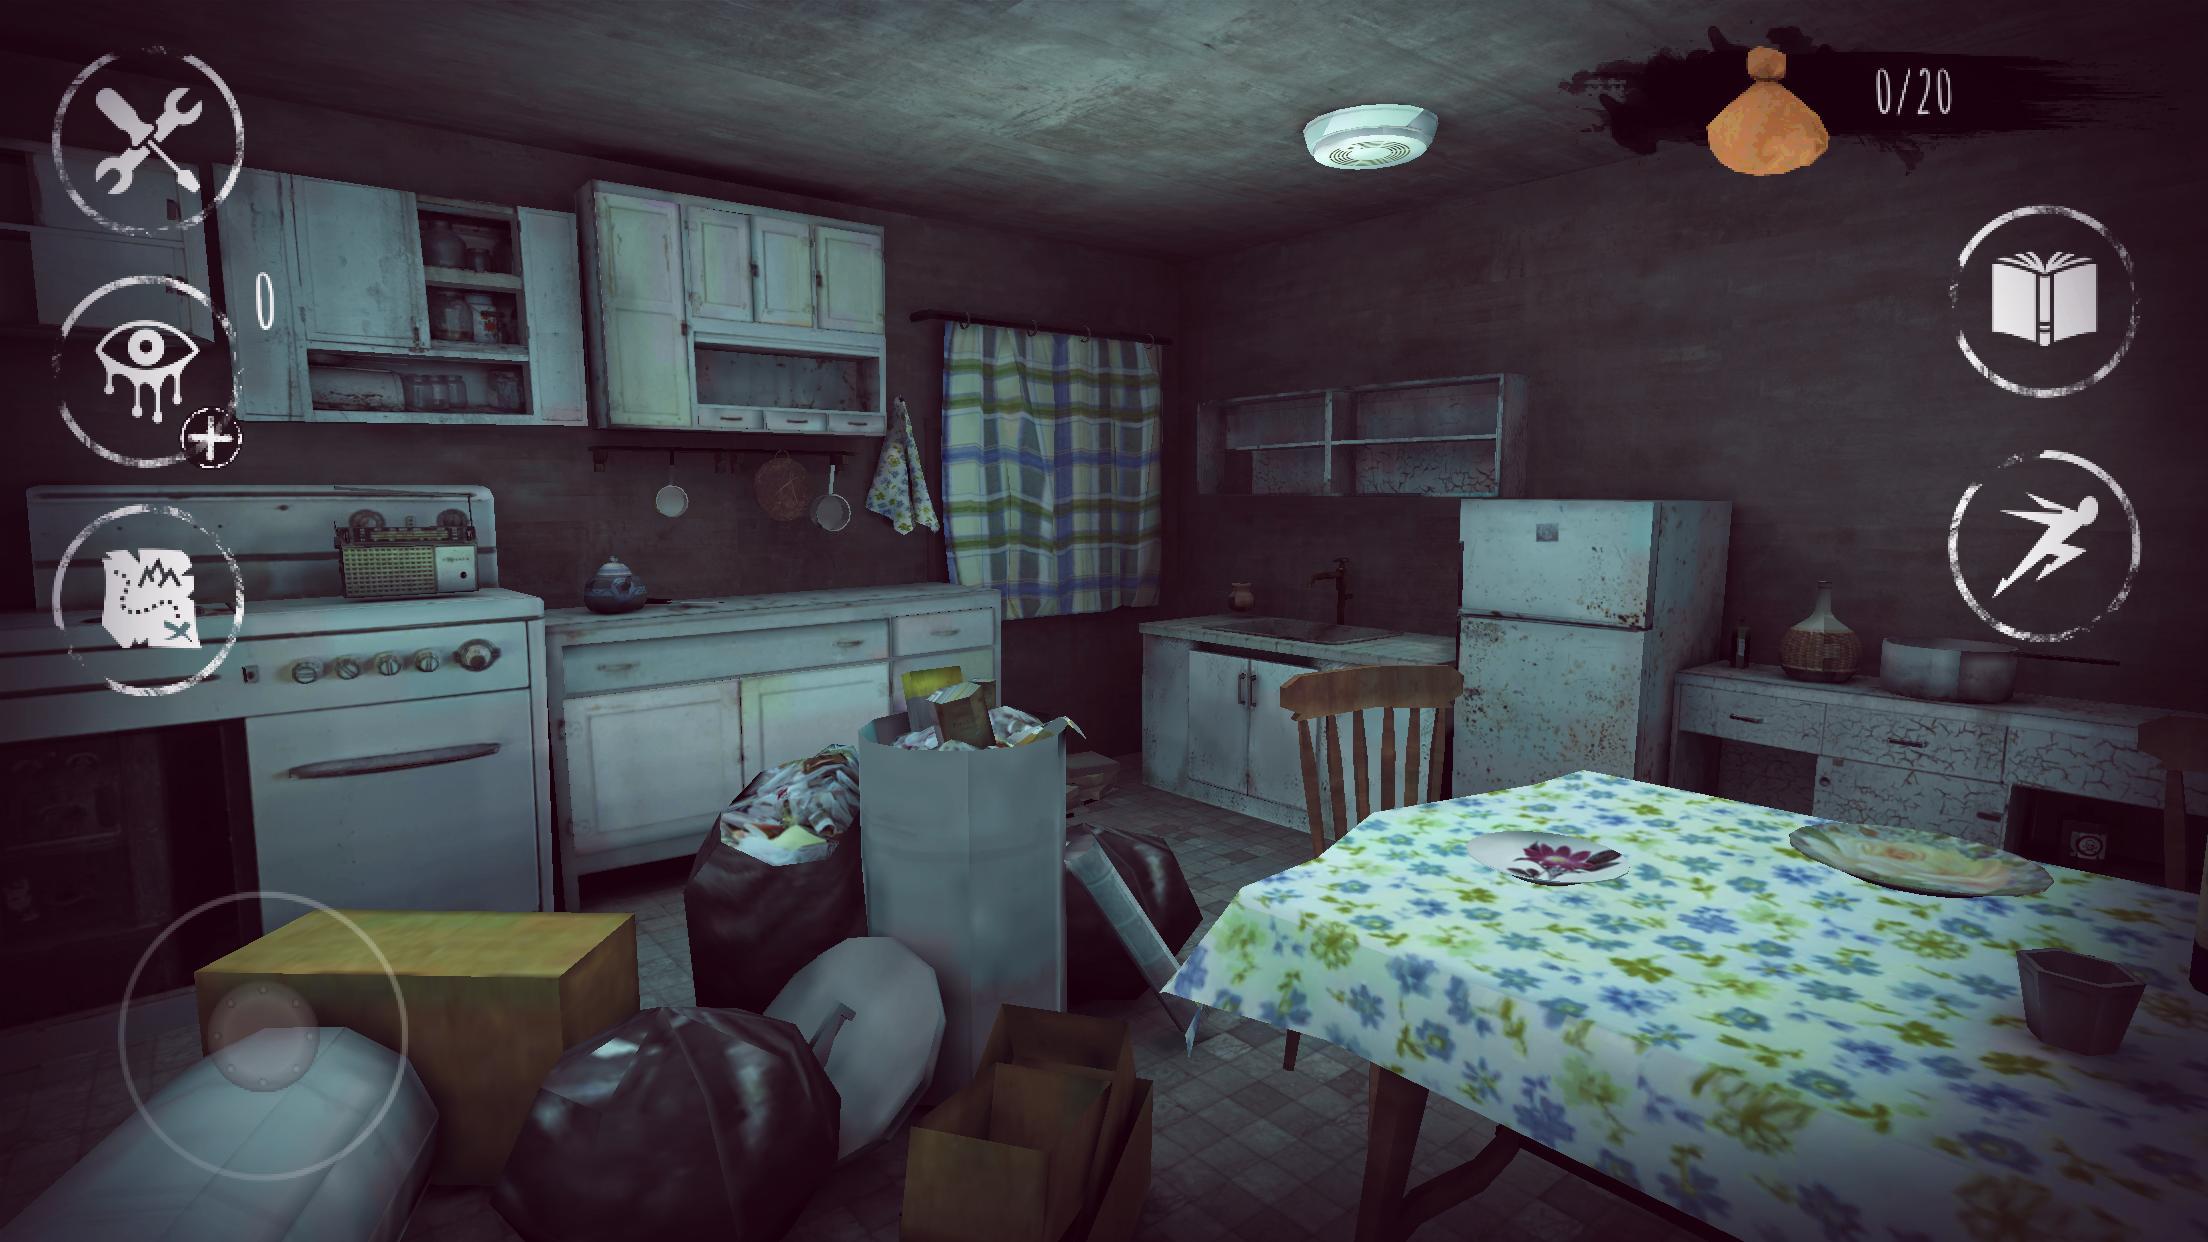 Eyes: Scary Thriller - Creepy Horror Game 6.1.21 Screenshot 10